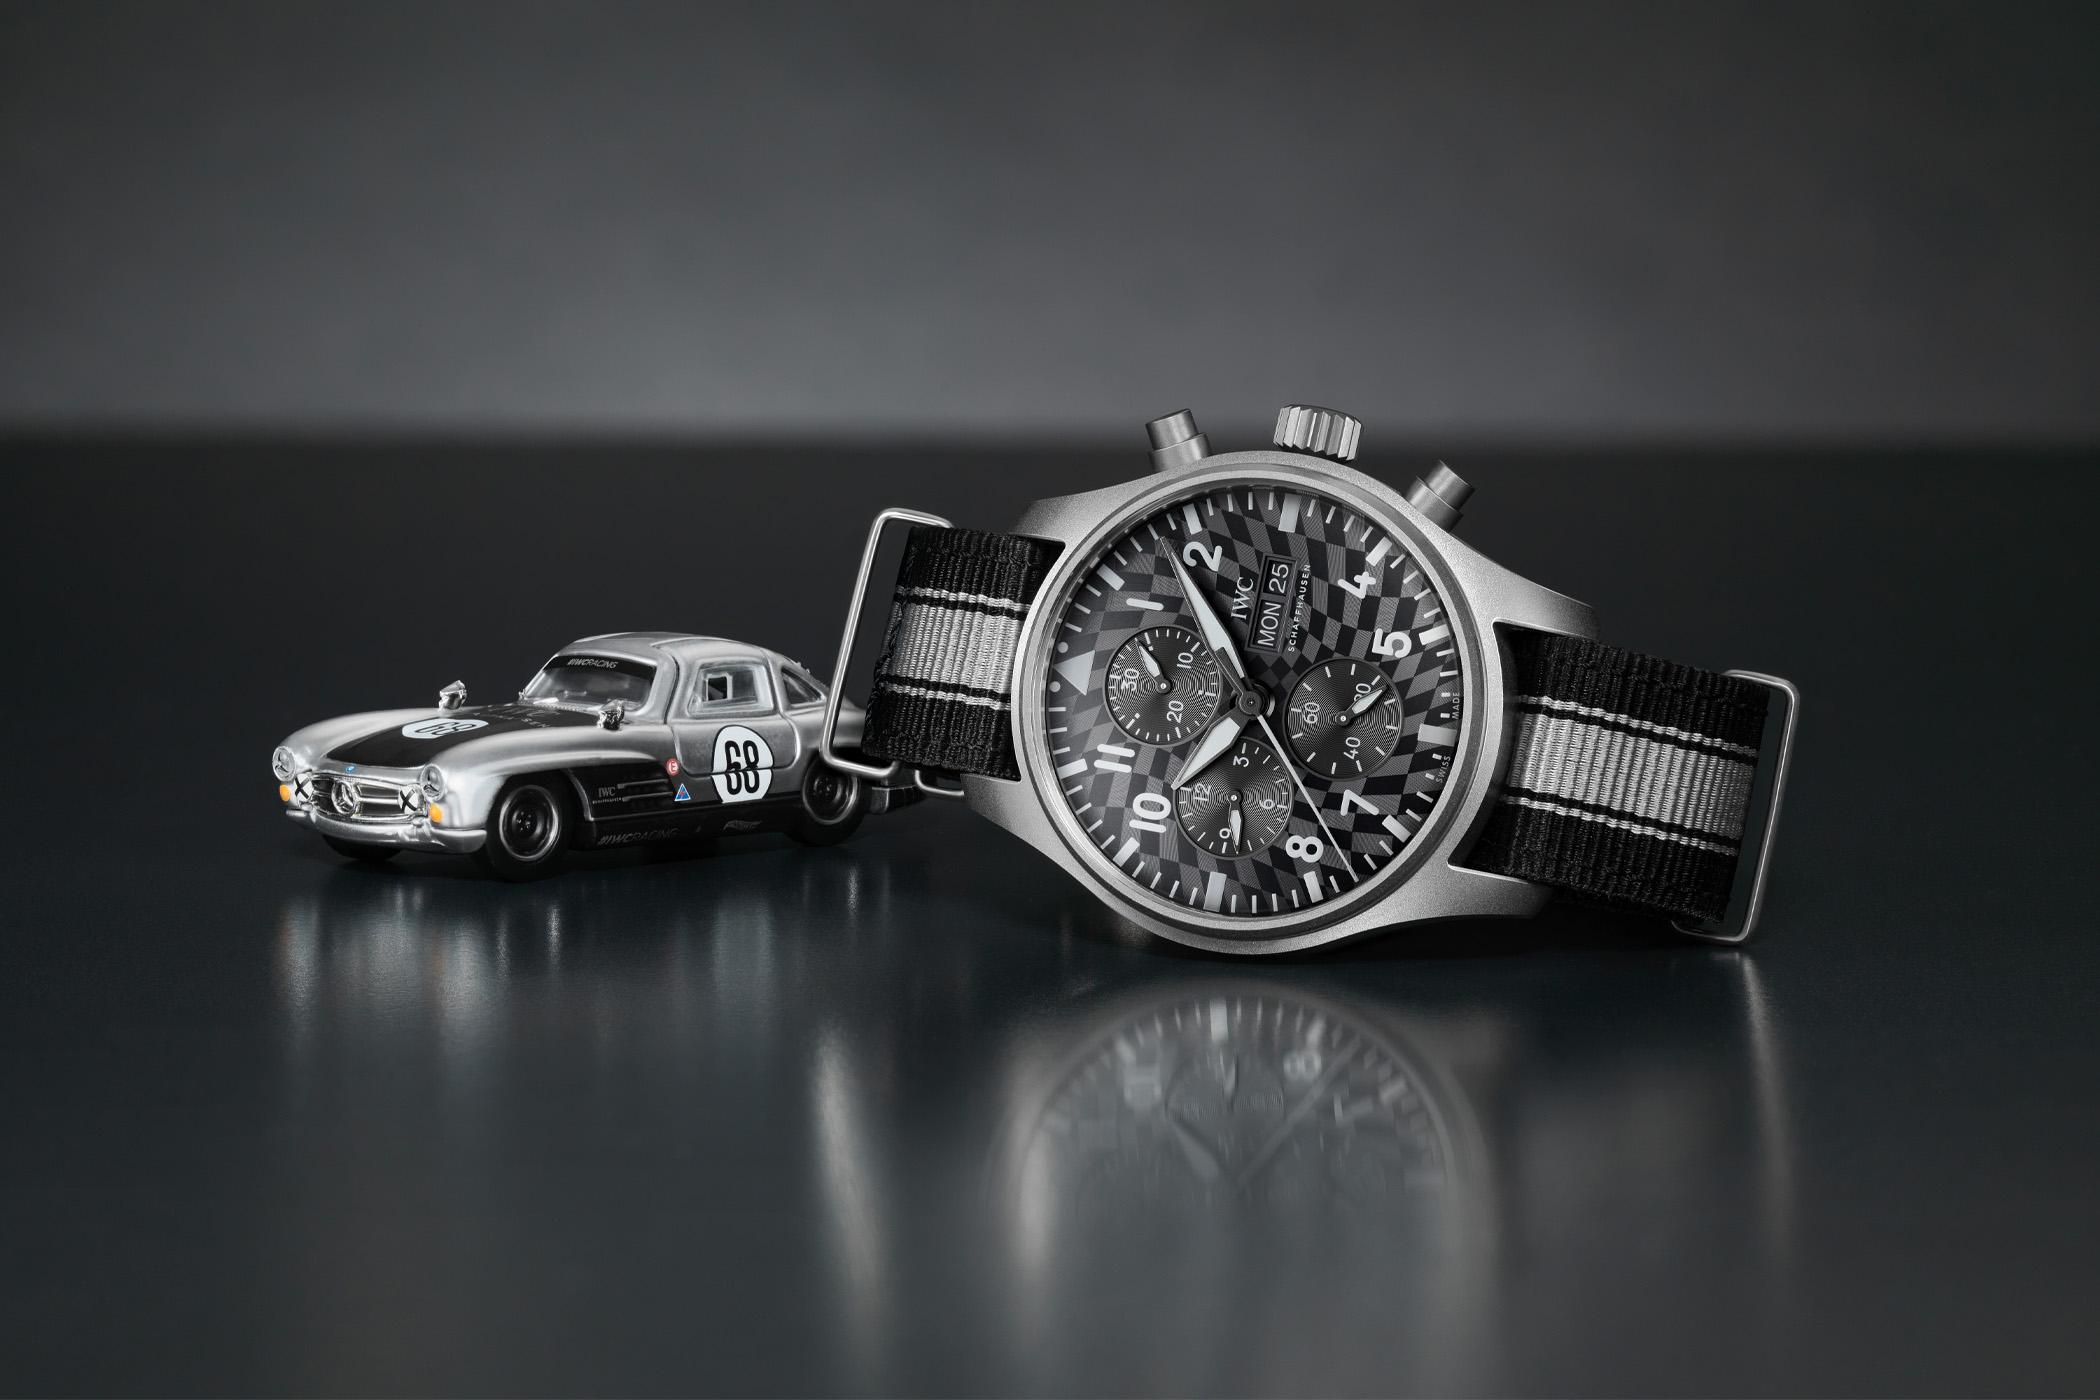 IWC Pilot's Watch Chronograph Edition IWC x Hot Wheels Racing Works IW377904